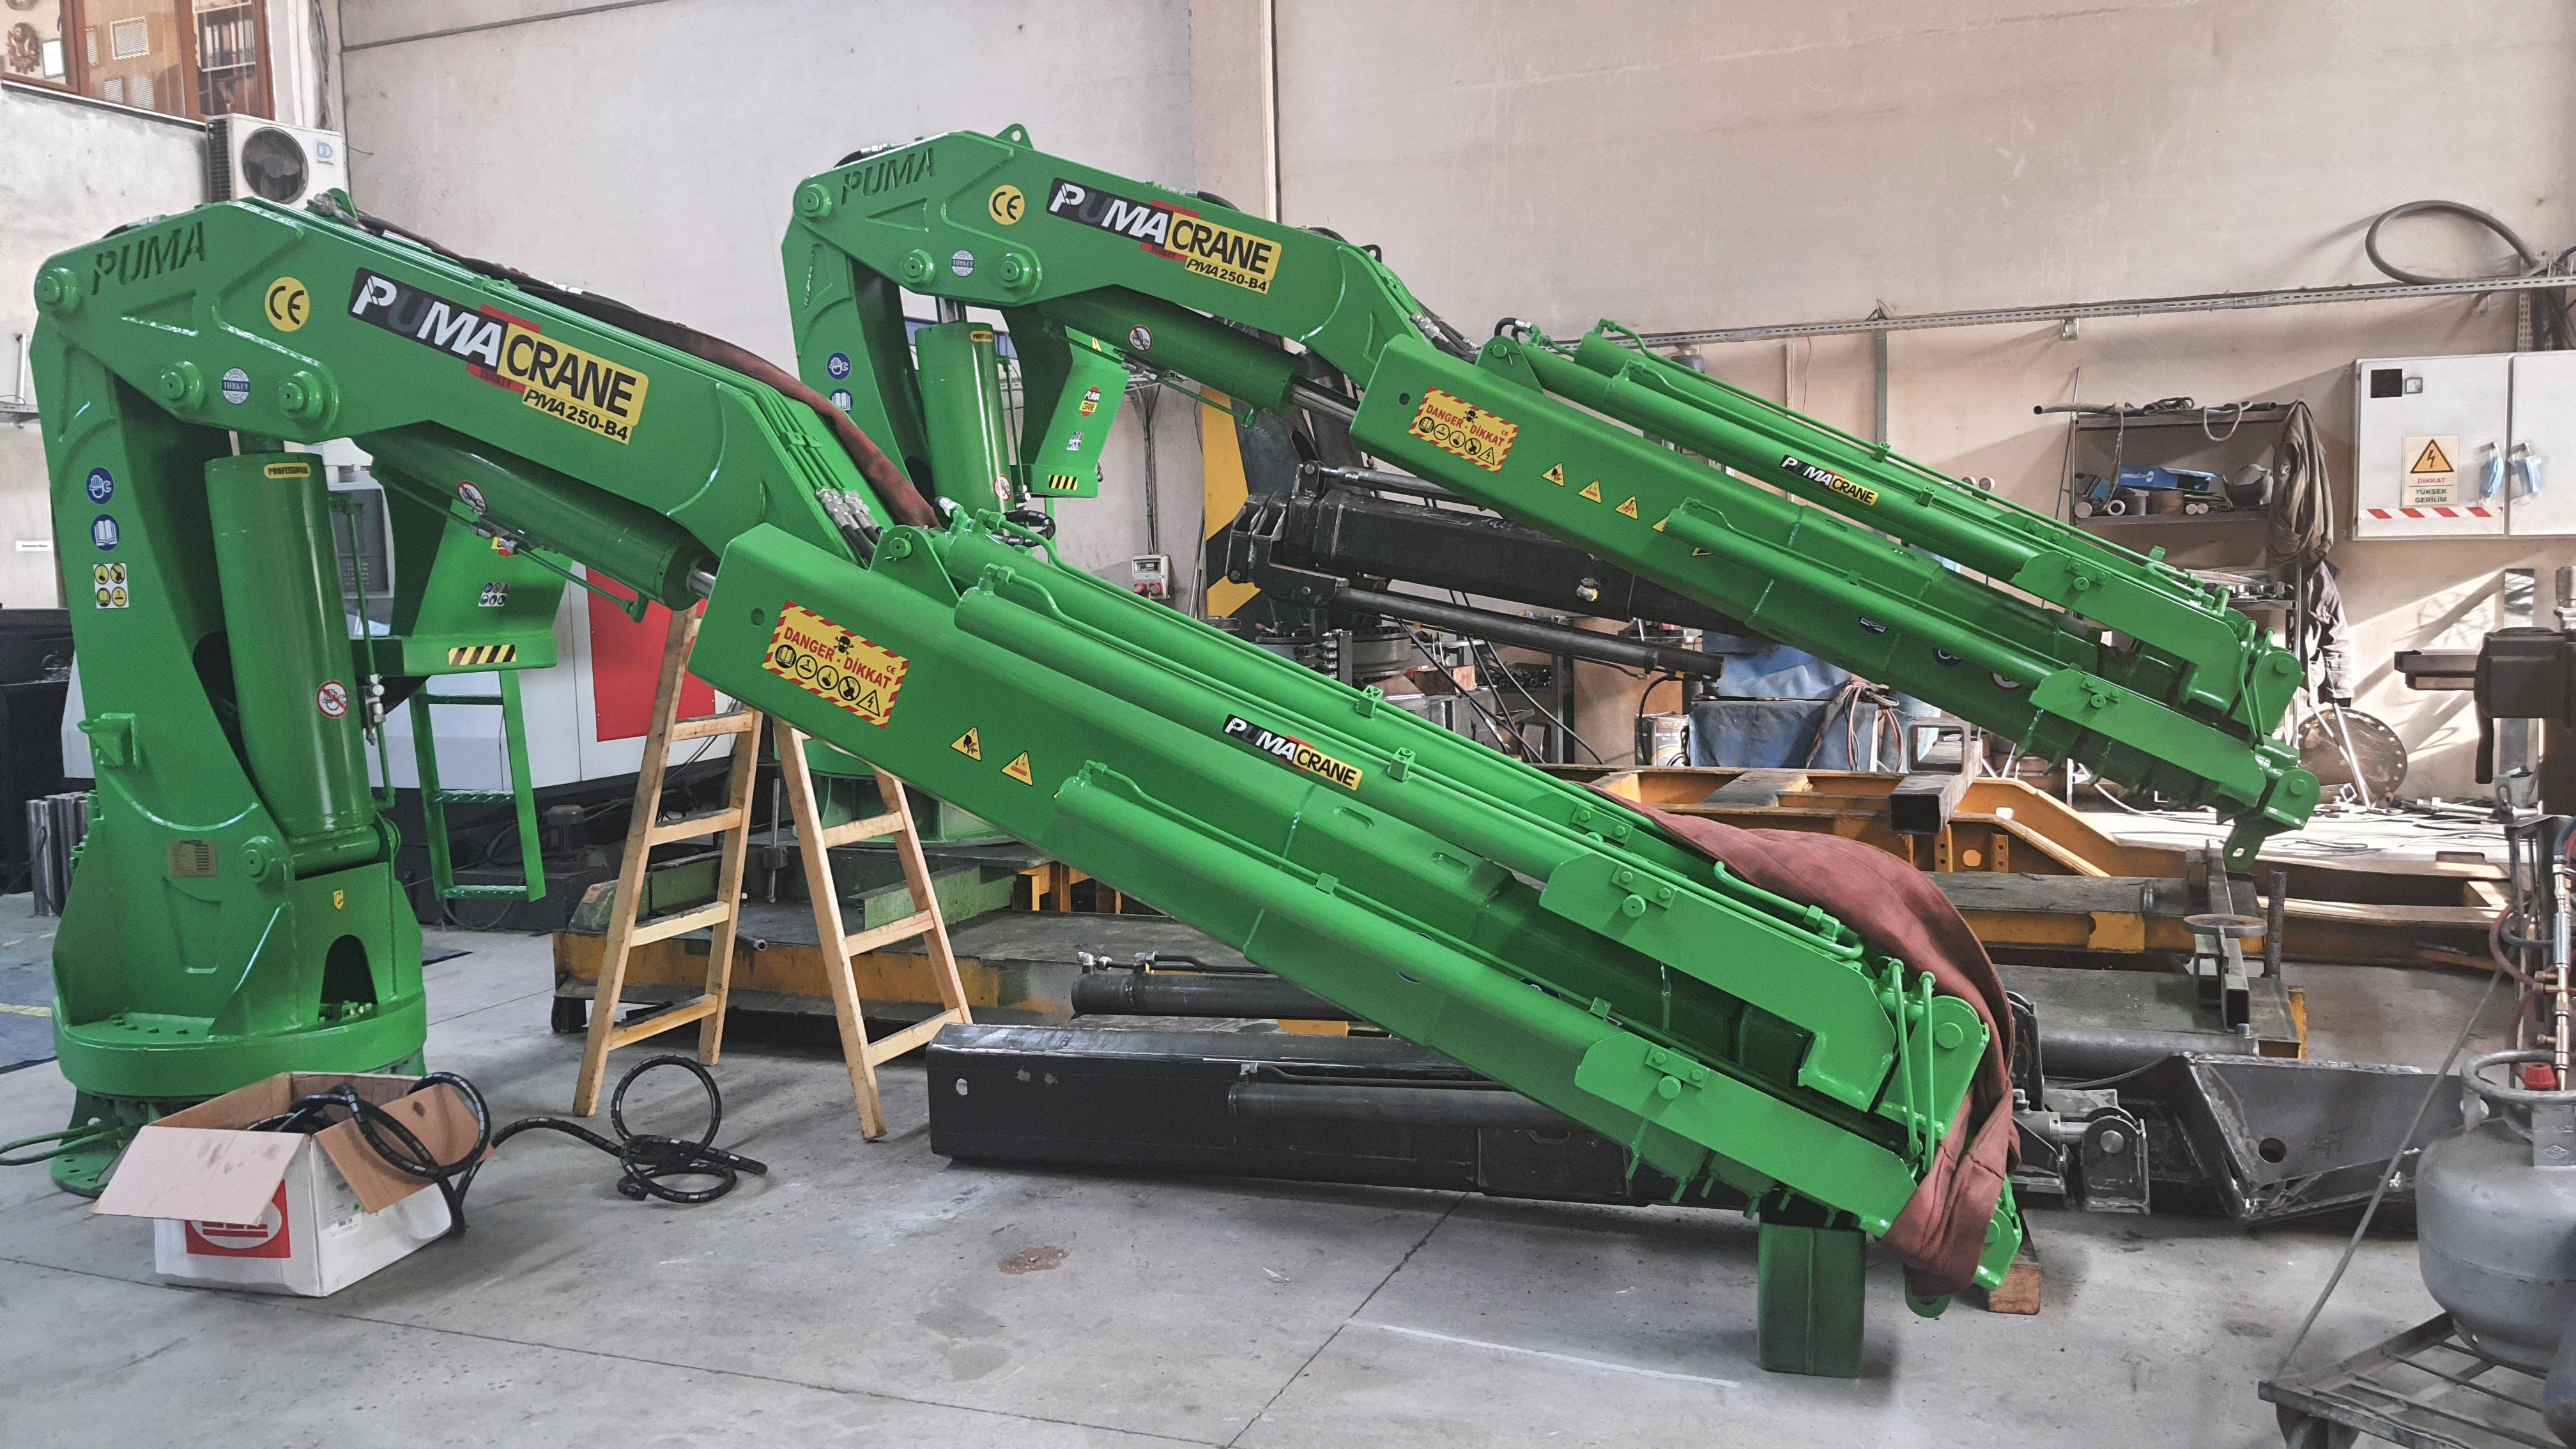 puma-marine-crane592556.jpg